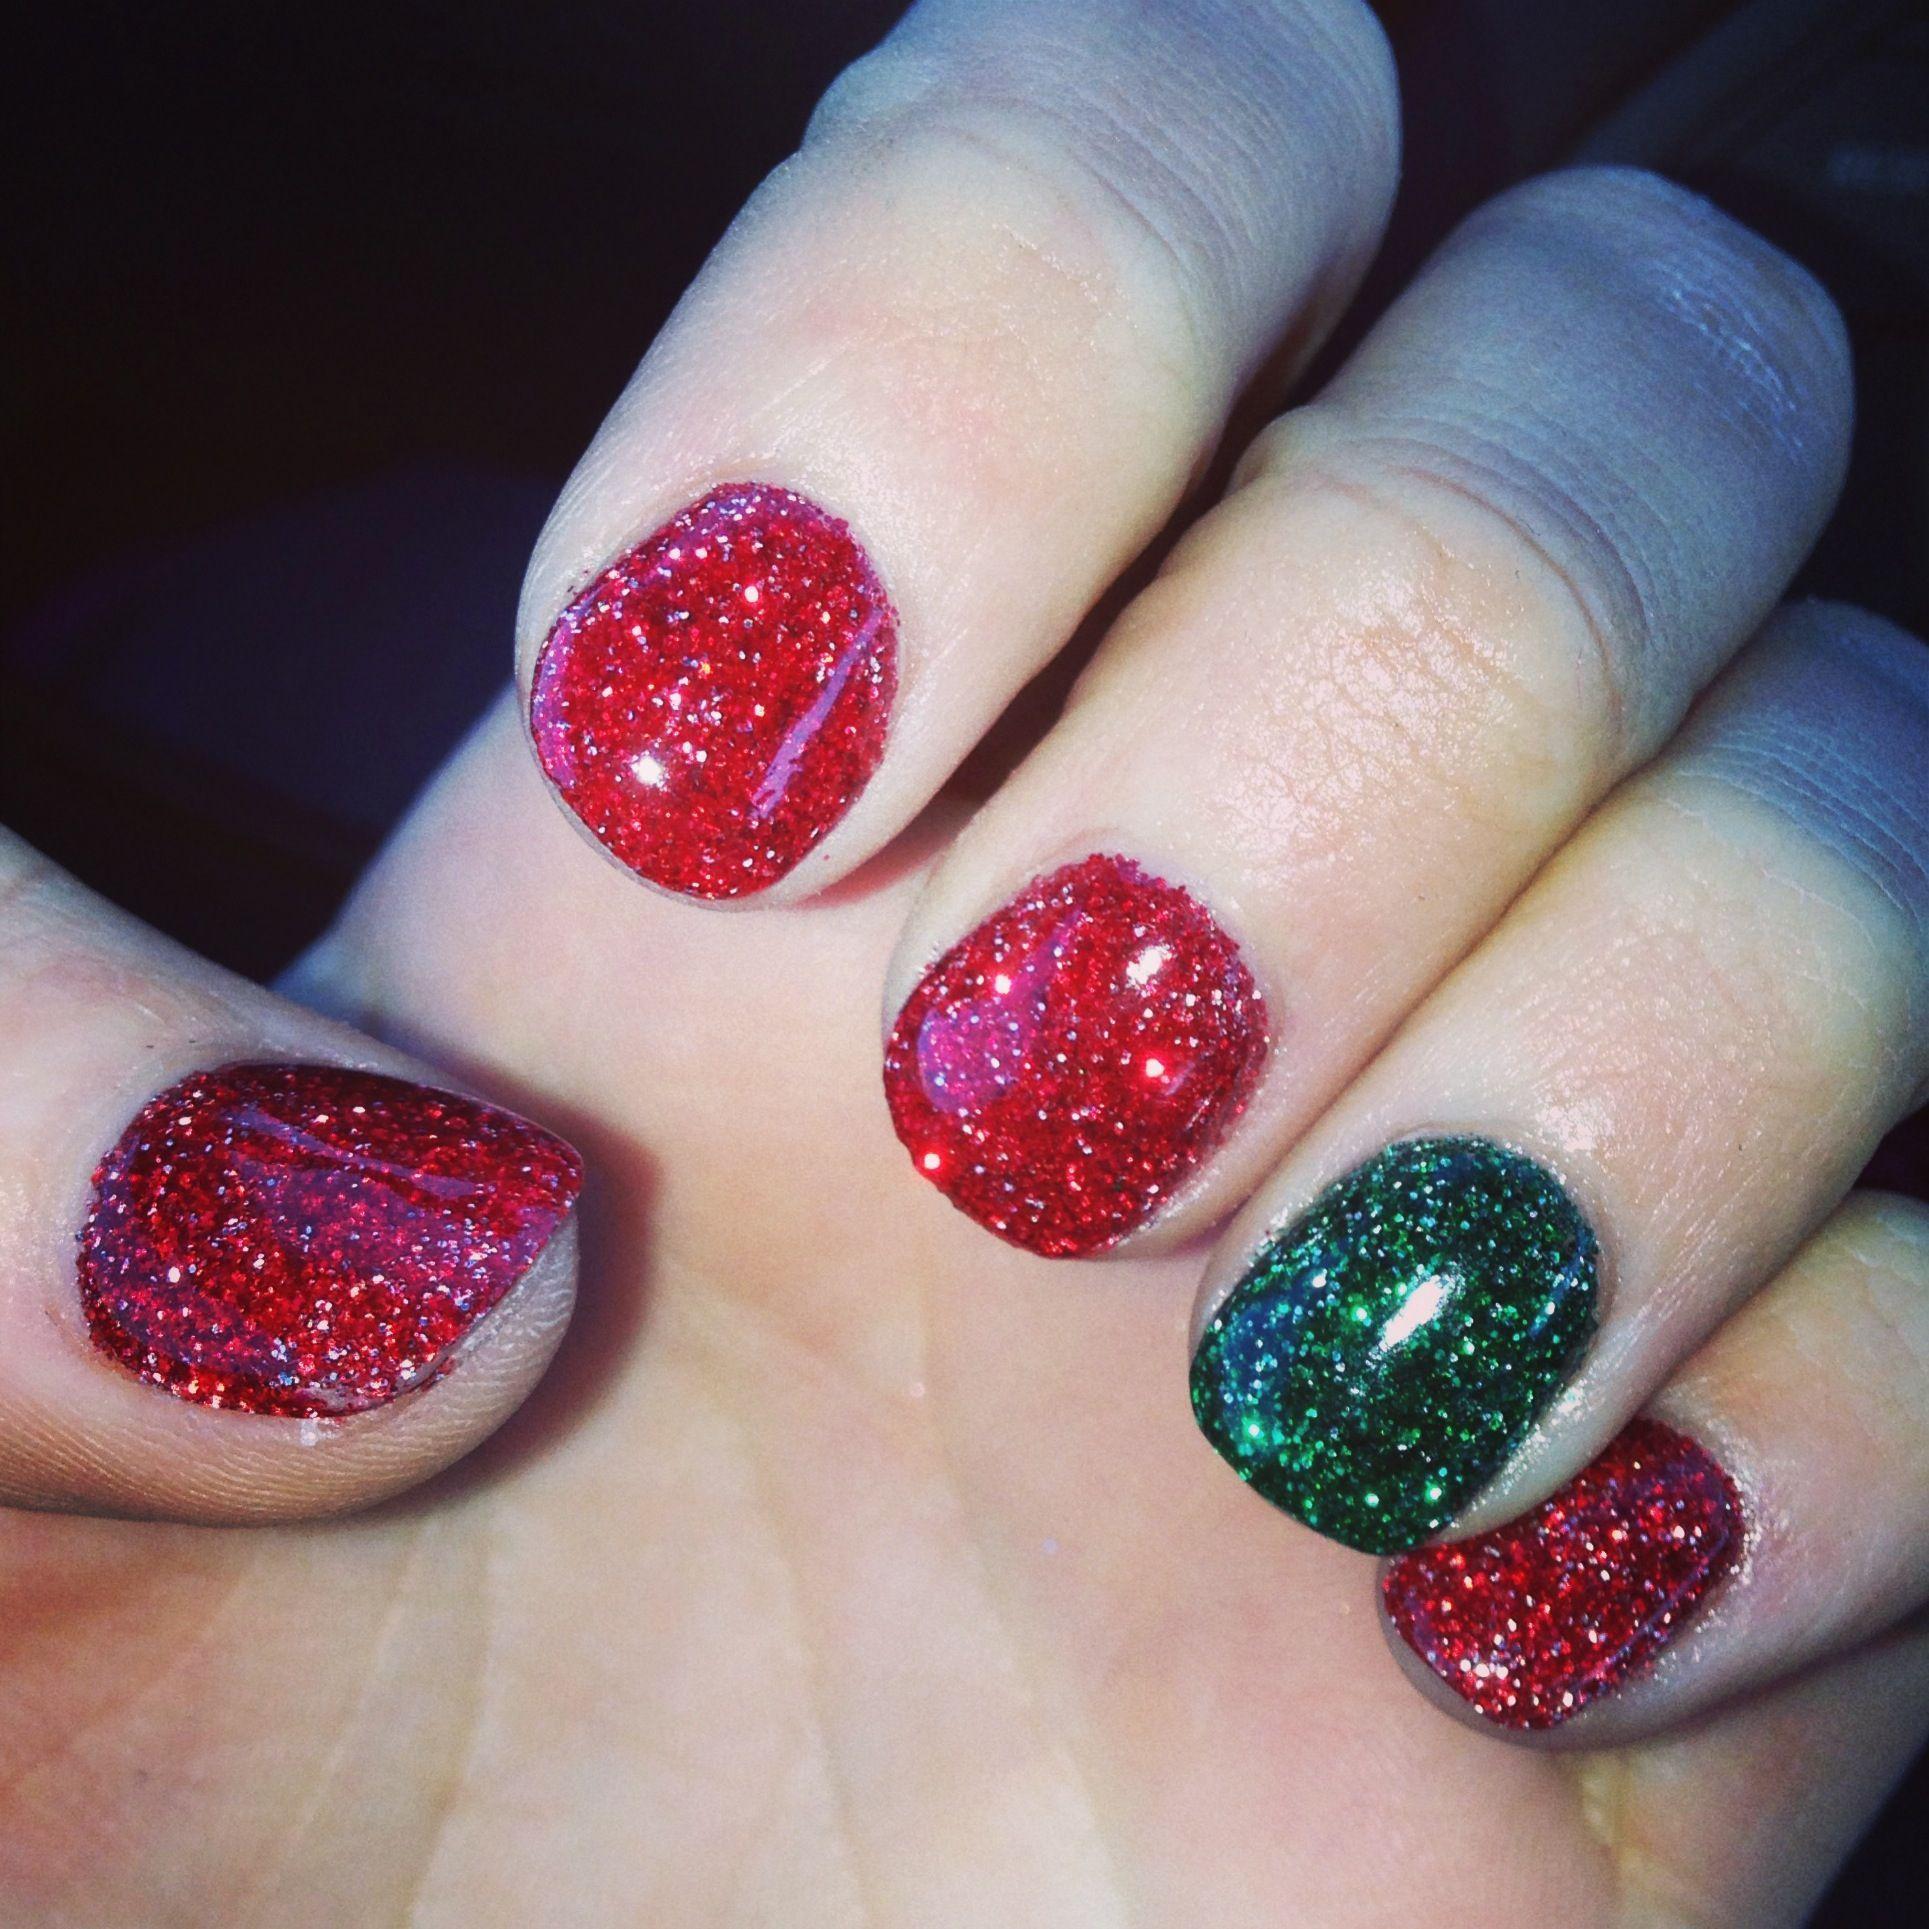 My Christmas nails. SNS powder gel. No UV light